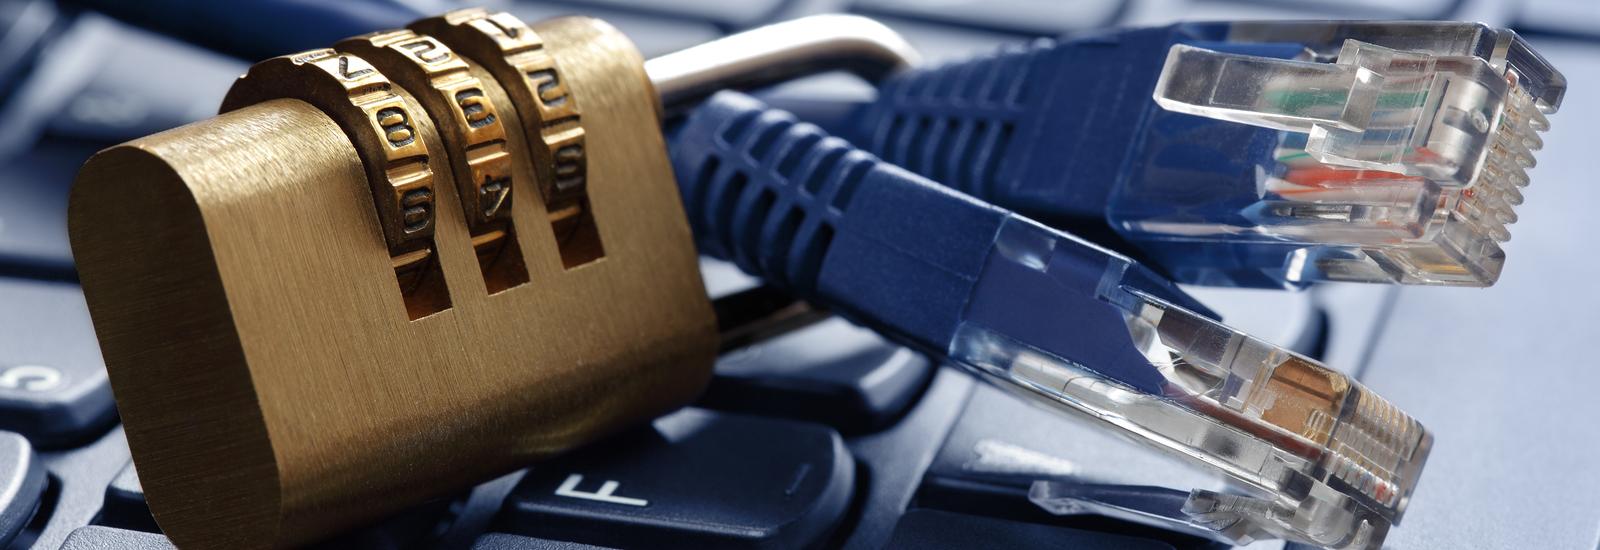 seguridad-informatica-para-empresas-lima-peru